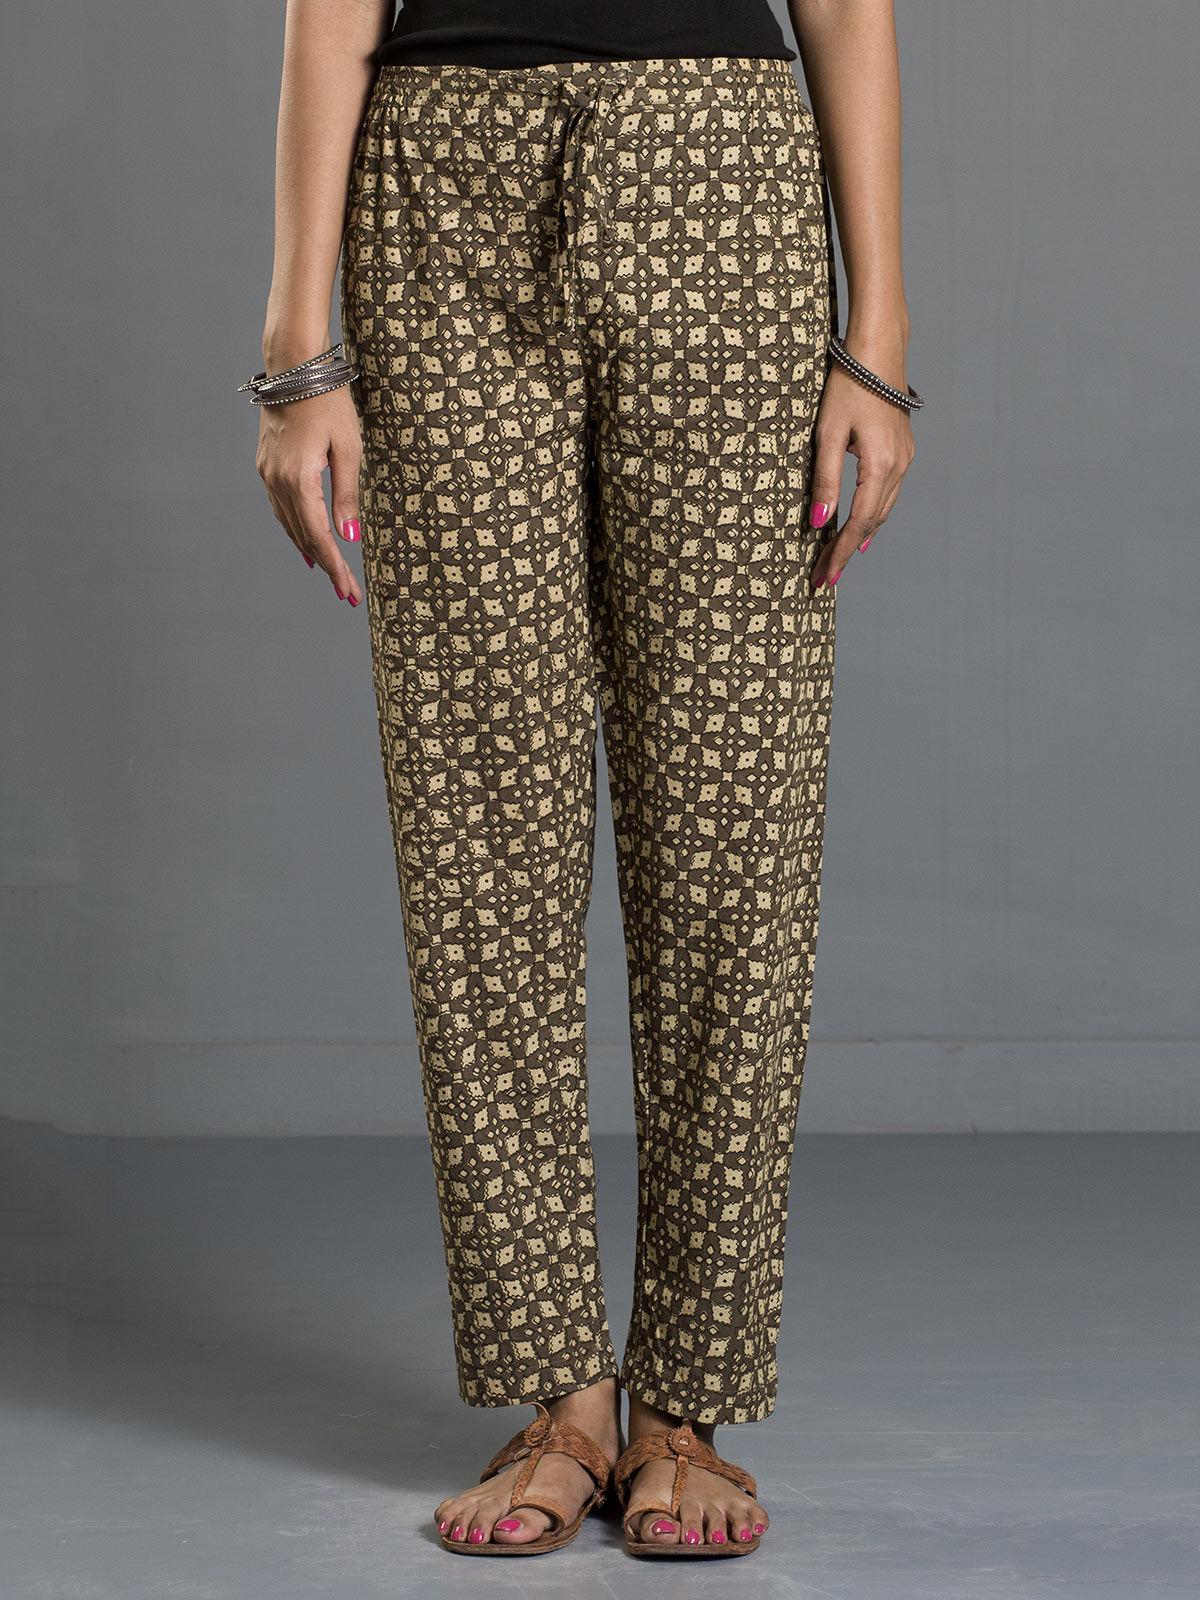 Olive Ajrak Printed Tie-up Cotton Pants